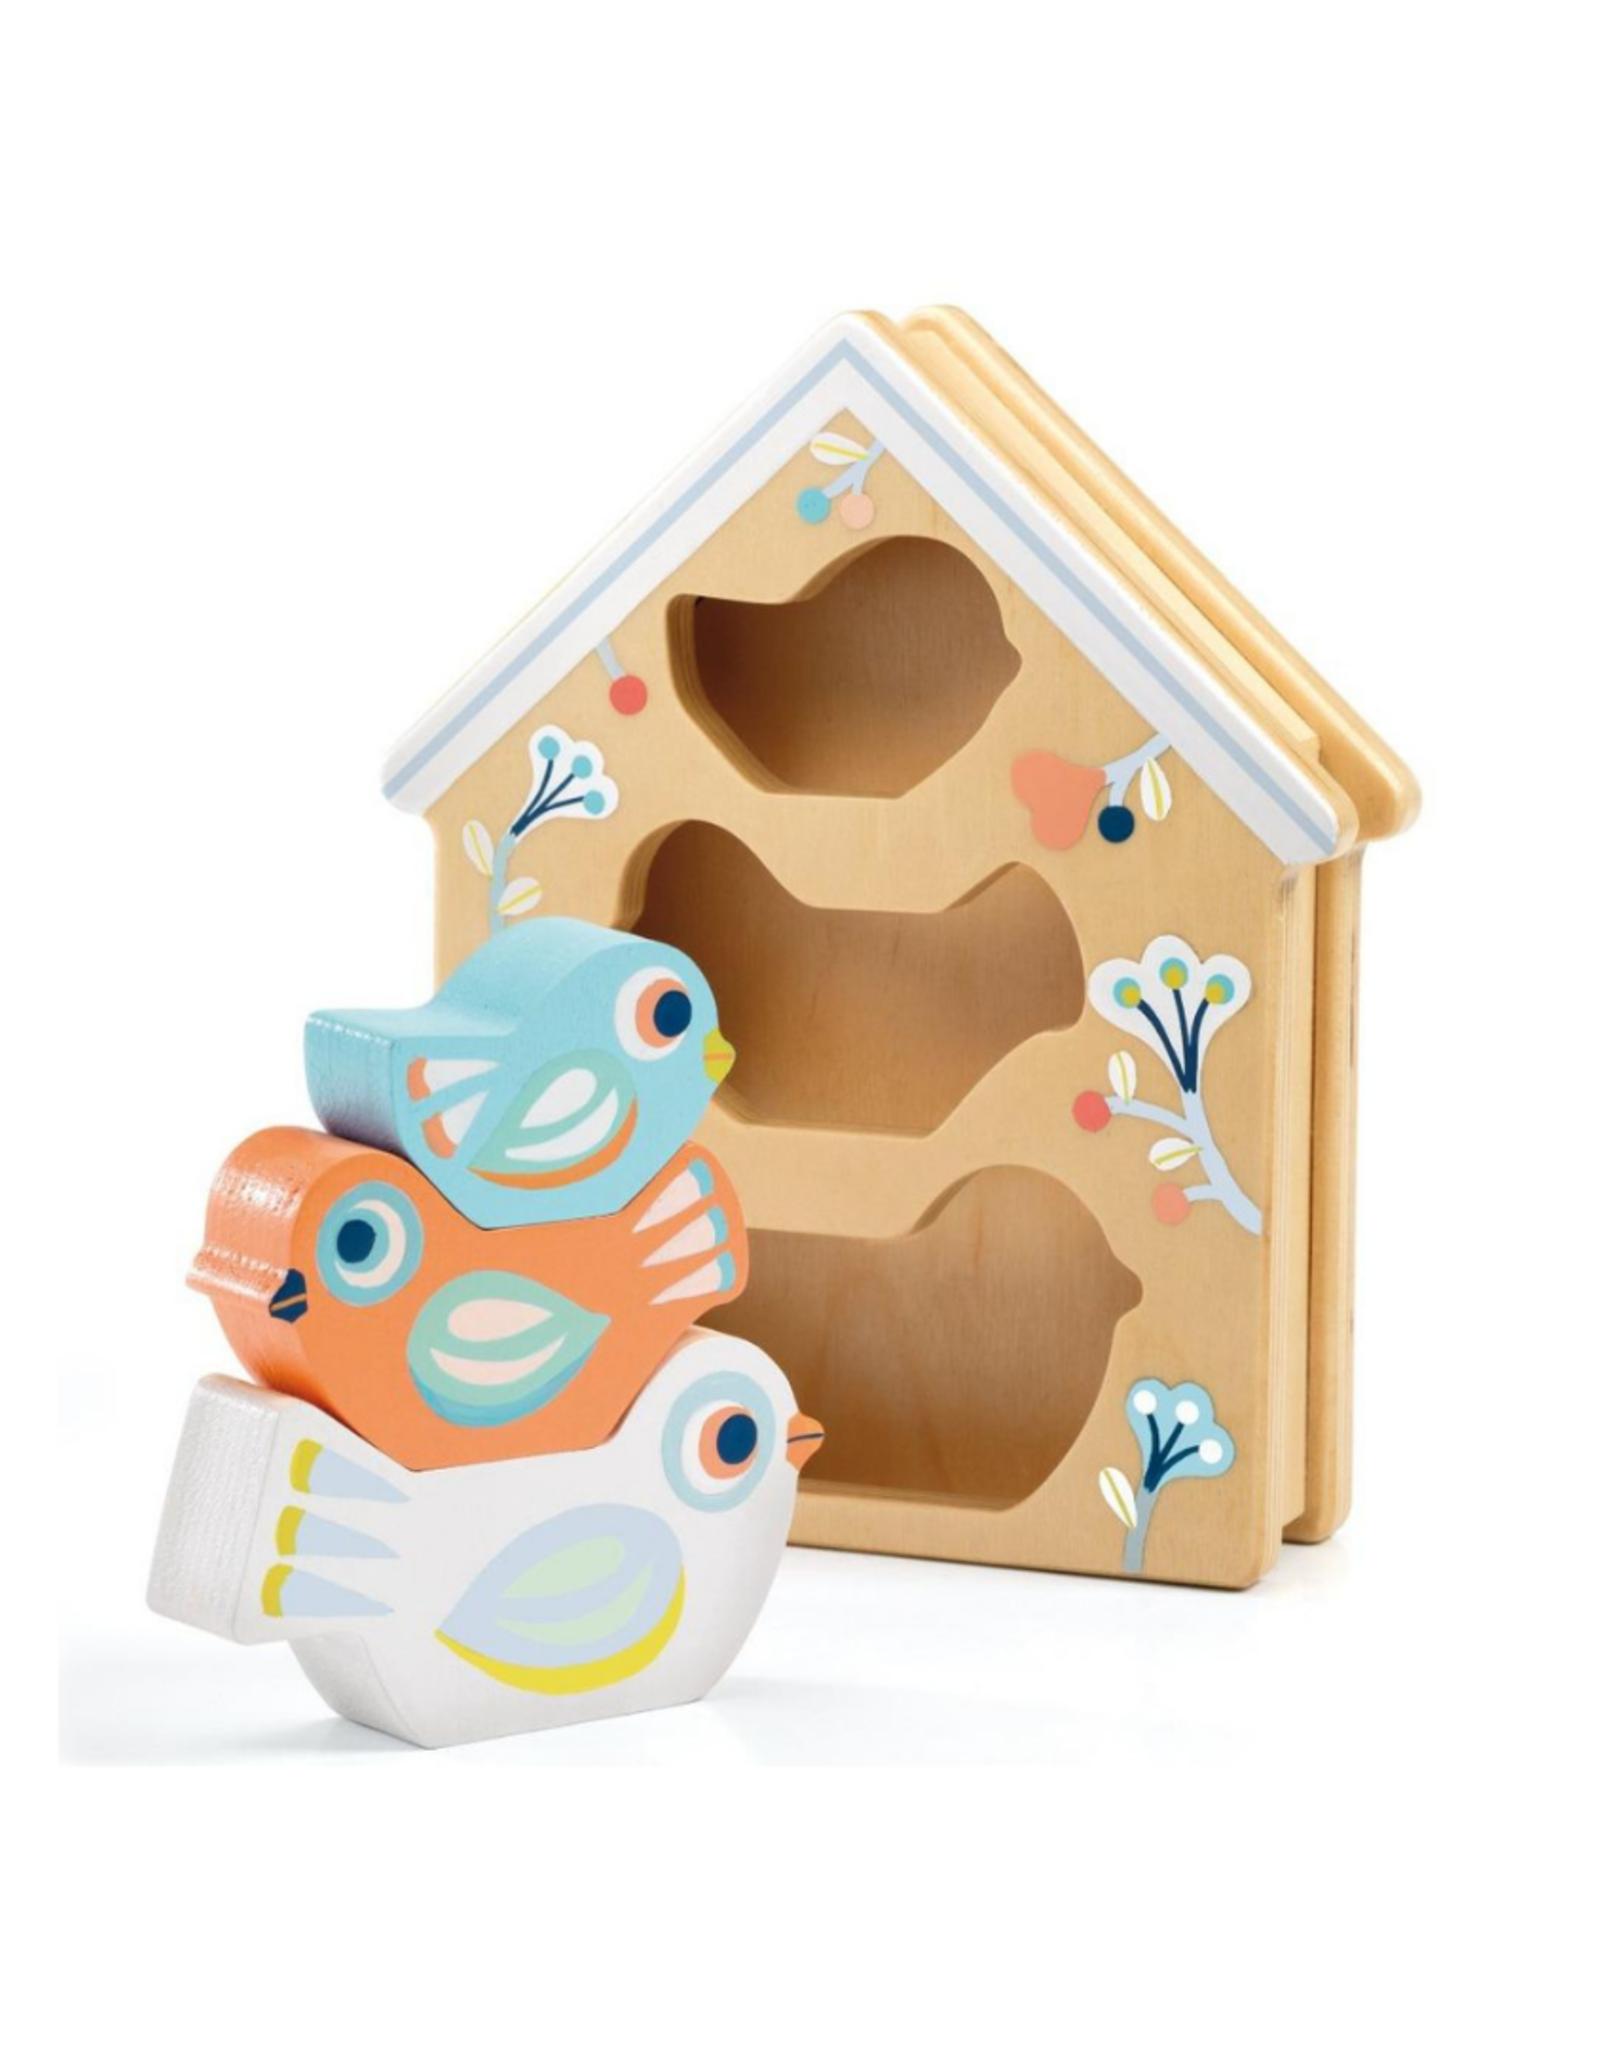 Djeco BabyBirdi - Wooden Puzzle